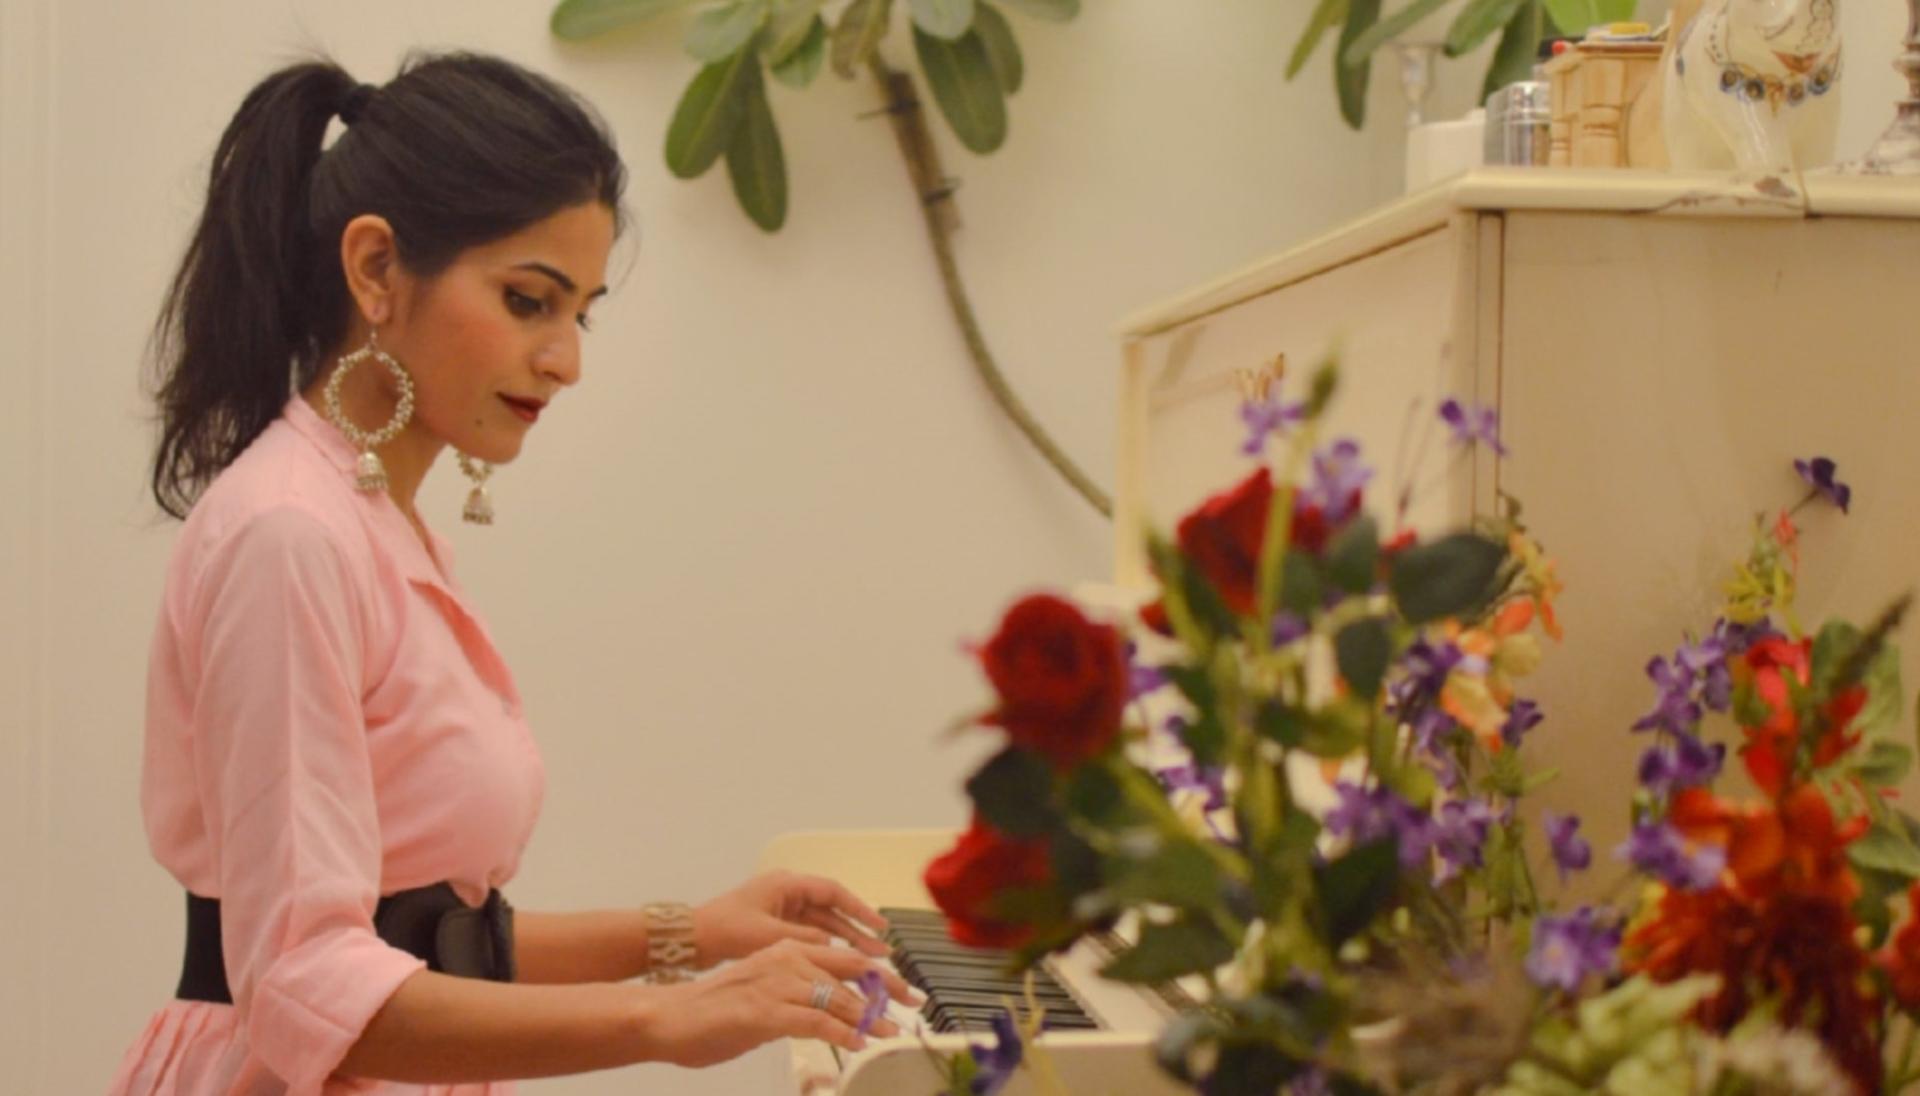 Kirti Sengar - A Dreamy, Filmy Fashionista turned Influencer image